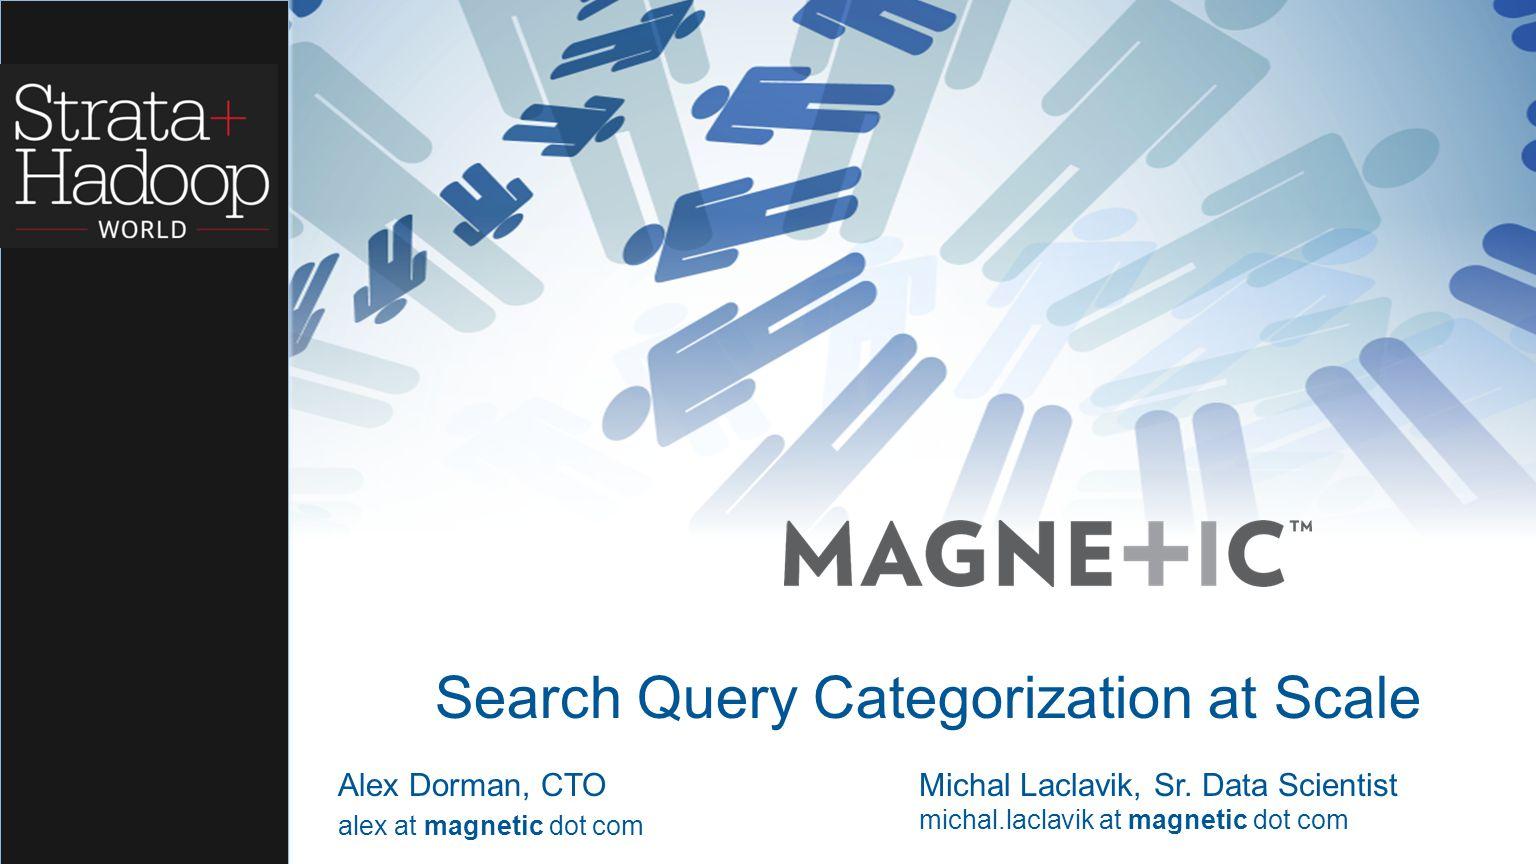 Search Query Categorization at Scale Alex Dorman, CTO alex at magnetic dot com Michal Laclavik, Sr. Data Scientist michal.laclavik at magnetic dot com